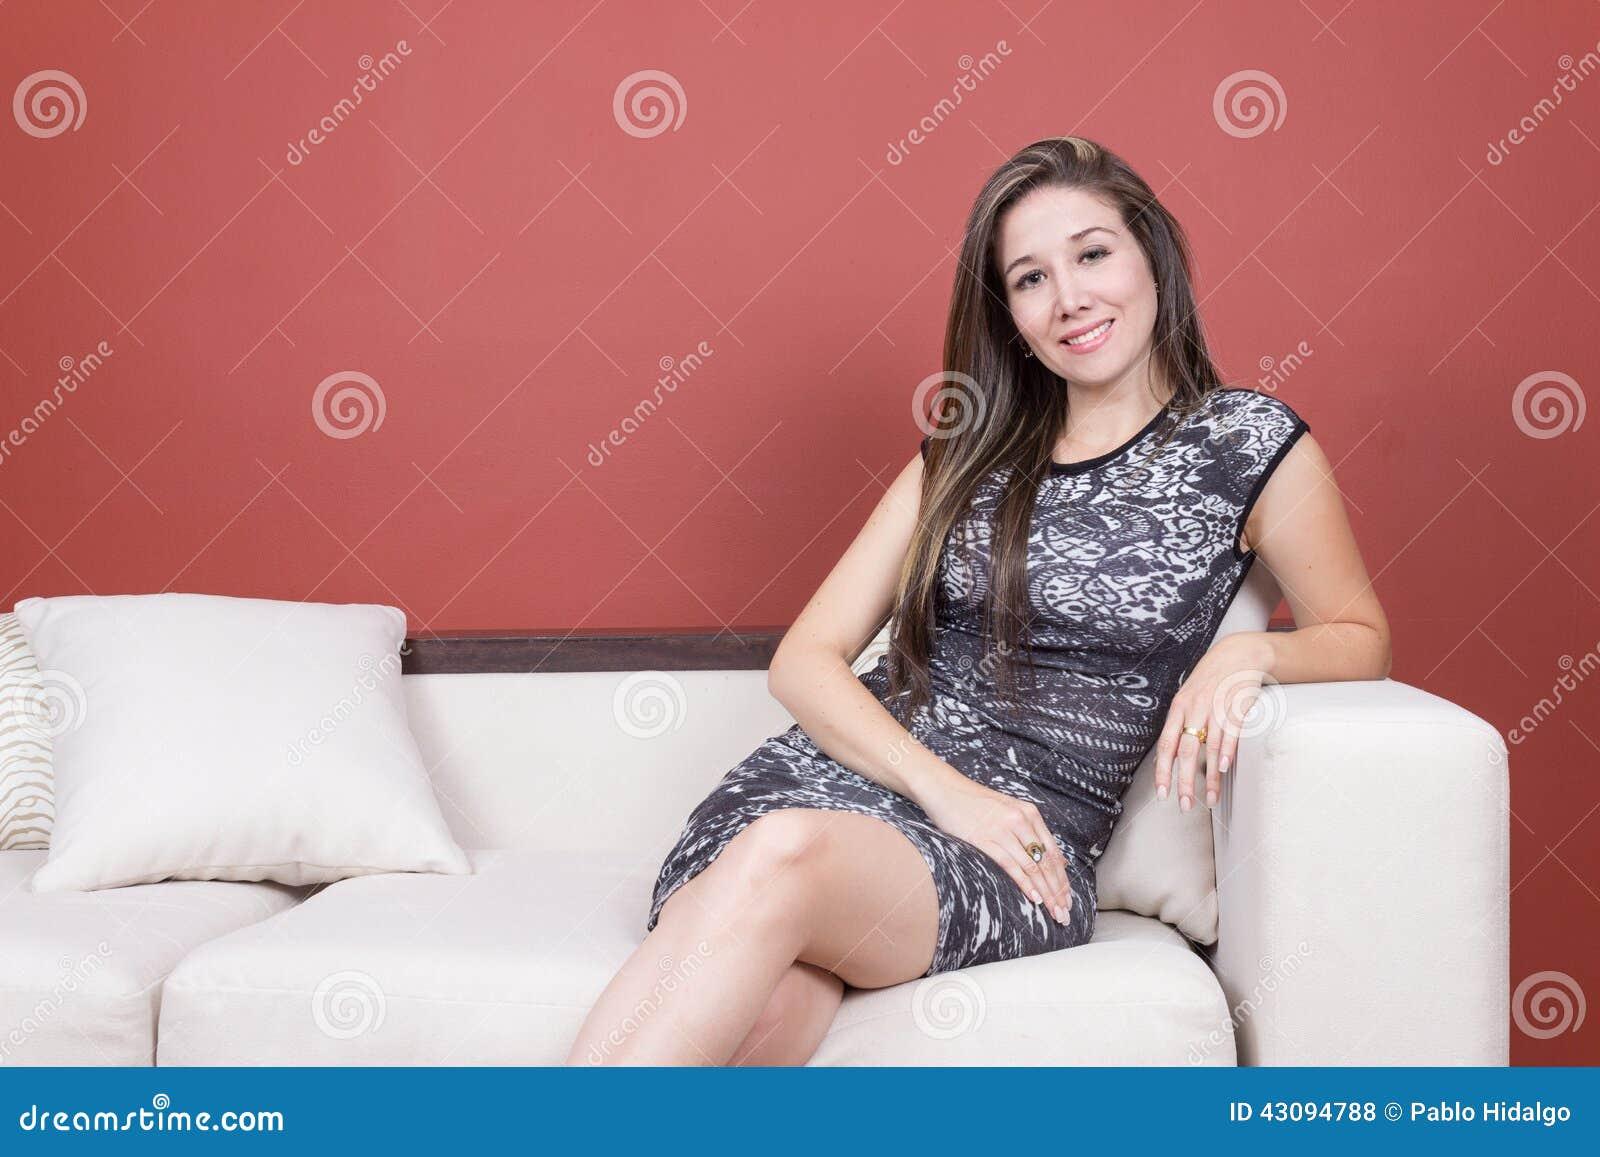 nude vegina of young girls